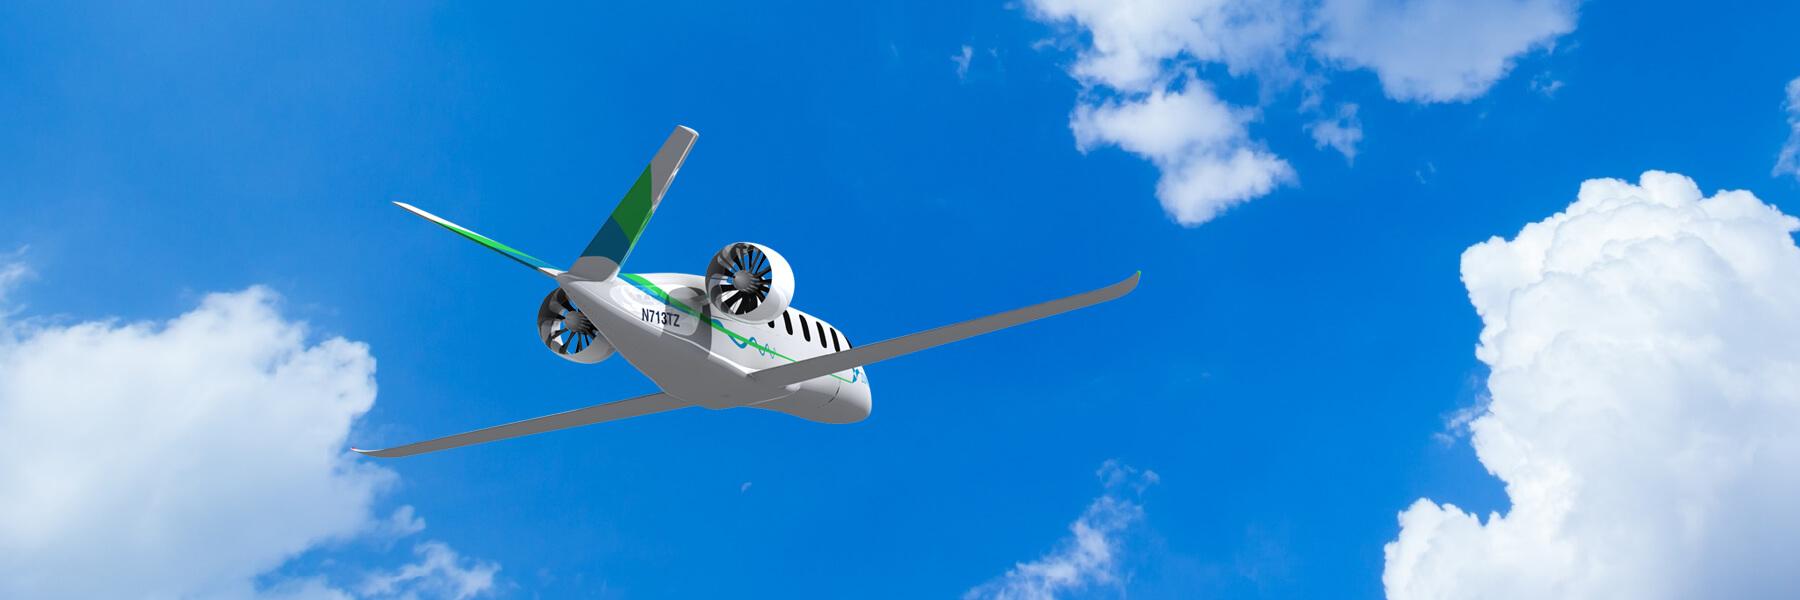 Zunum Aero hybridní elektrická letadla. Zdroj Zunum Aero